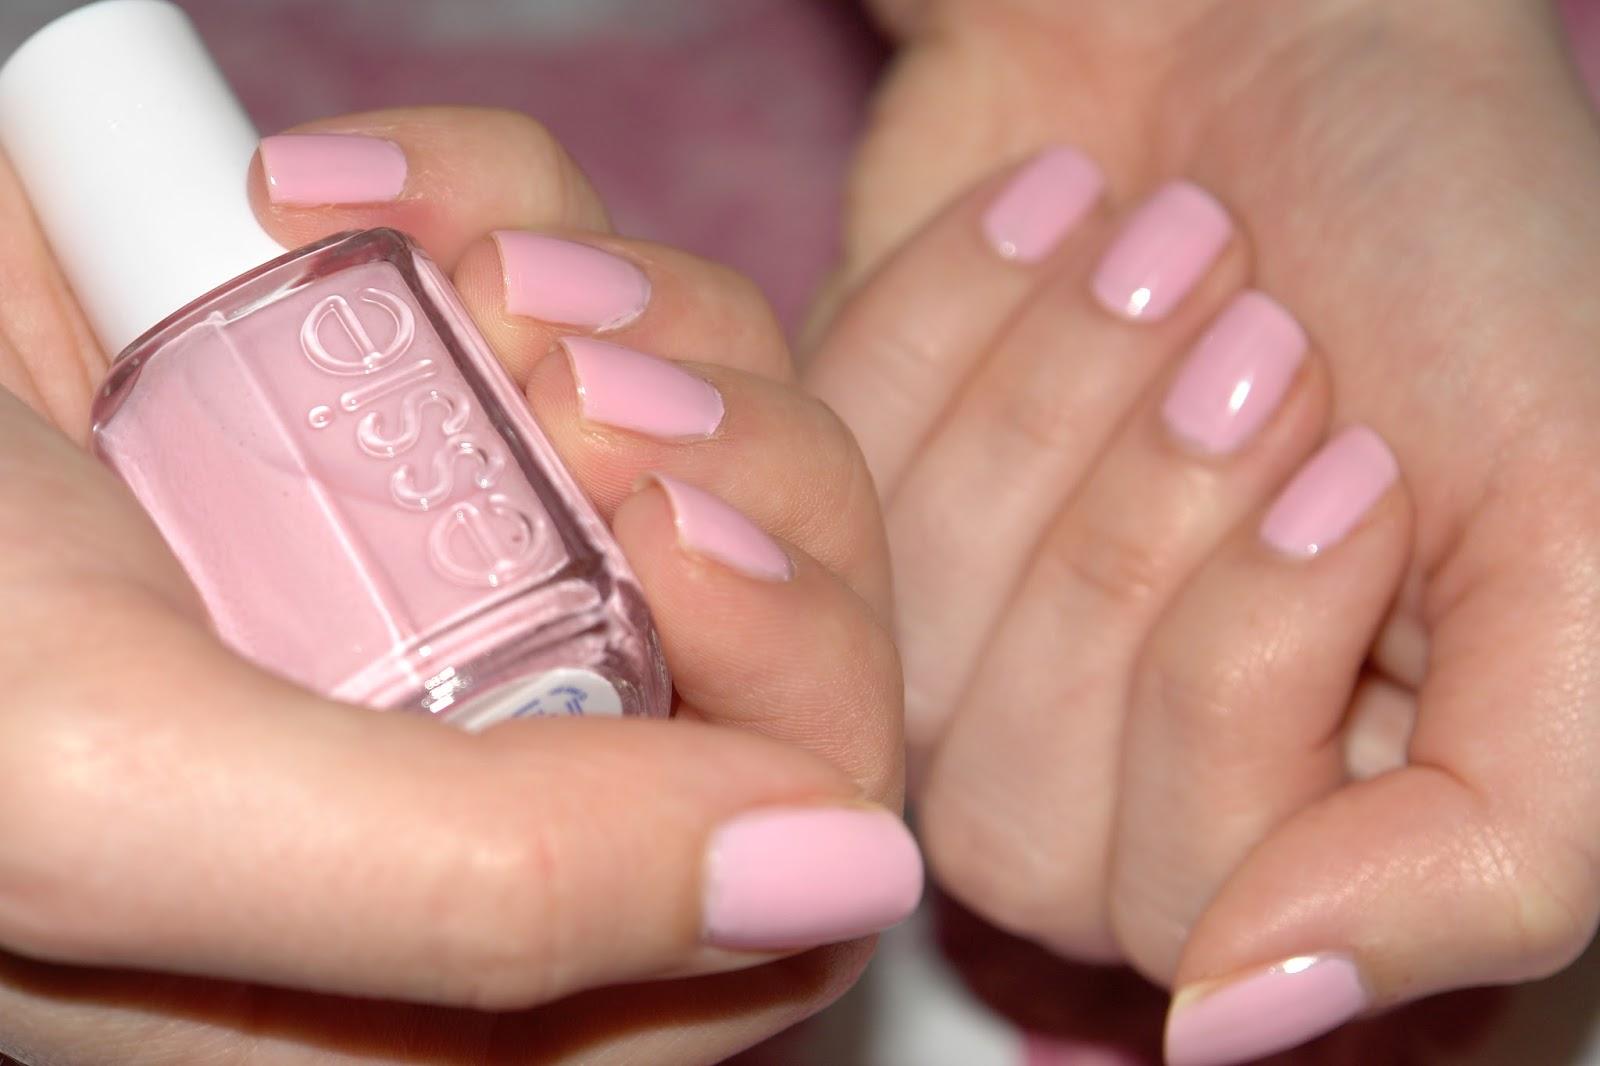 NAILS: Essie Guchi Muchi Puchi, Essie, nail polish, nails, NOTD, pink, review, beauty blog